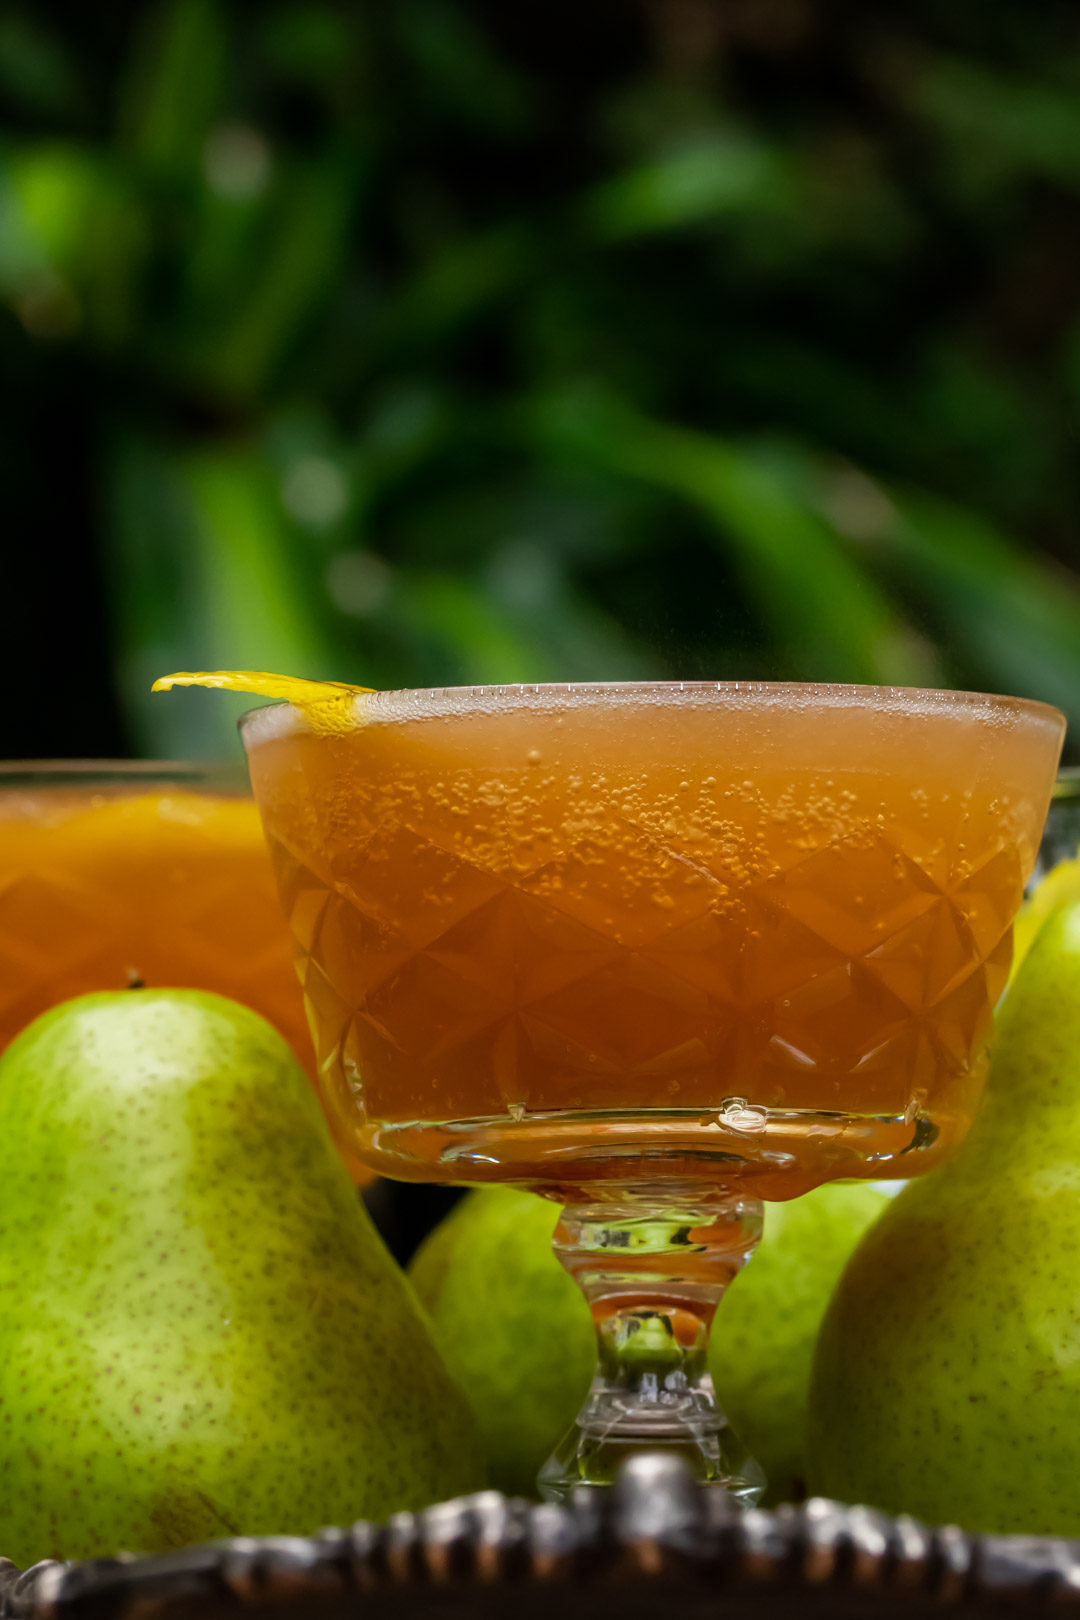 ginger pear champagne cocktail: eye level lemon garnish to left